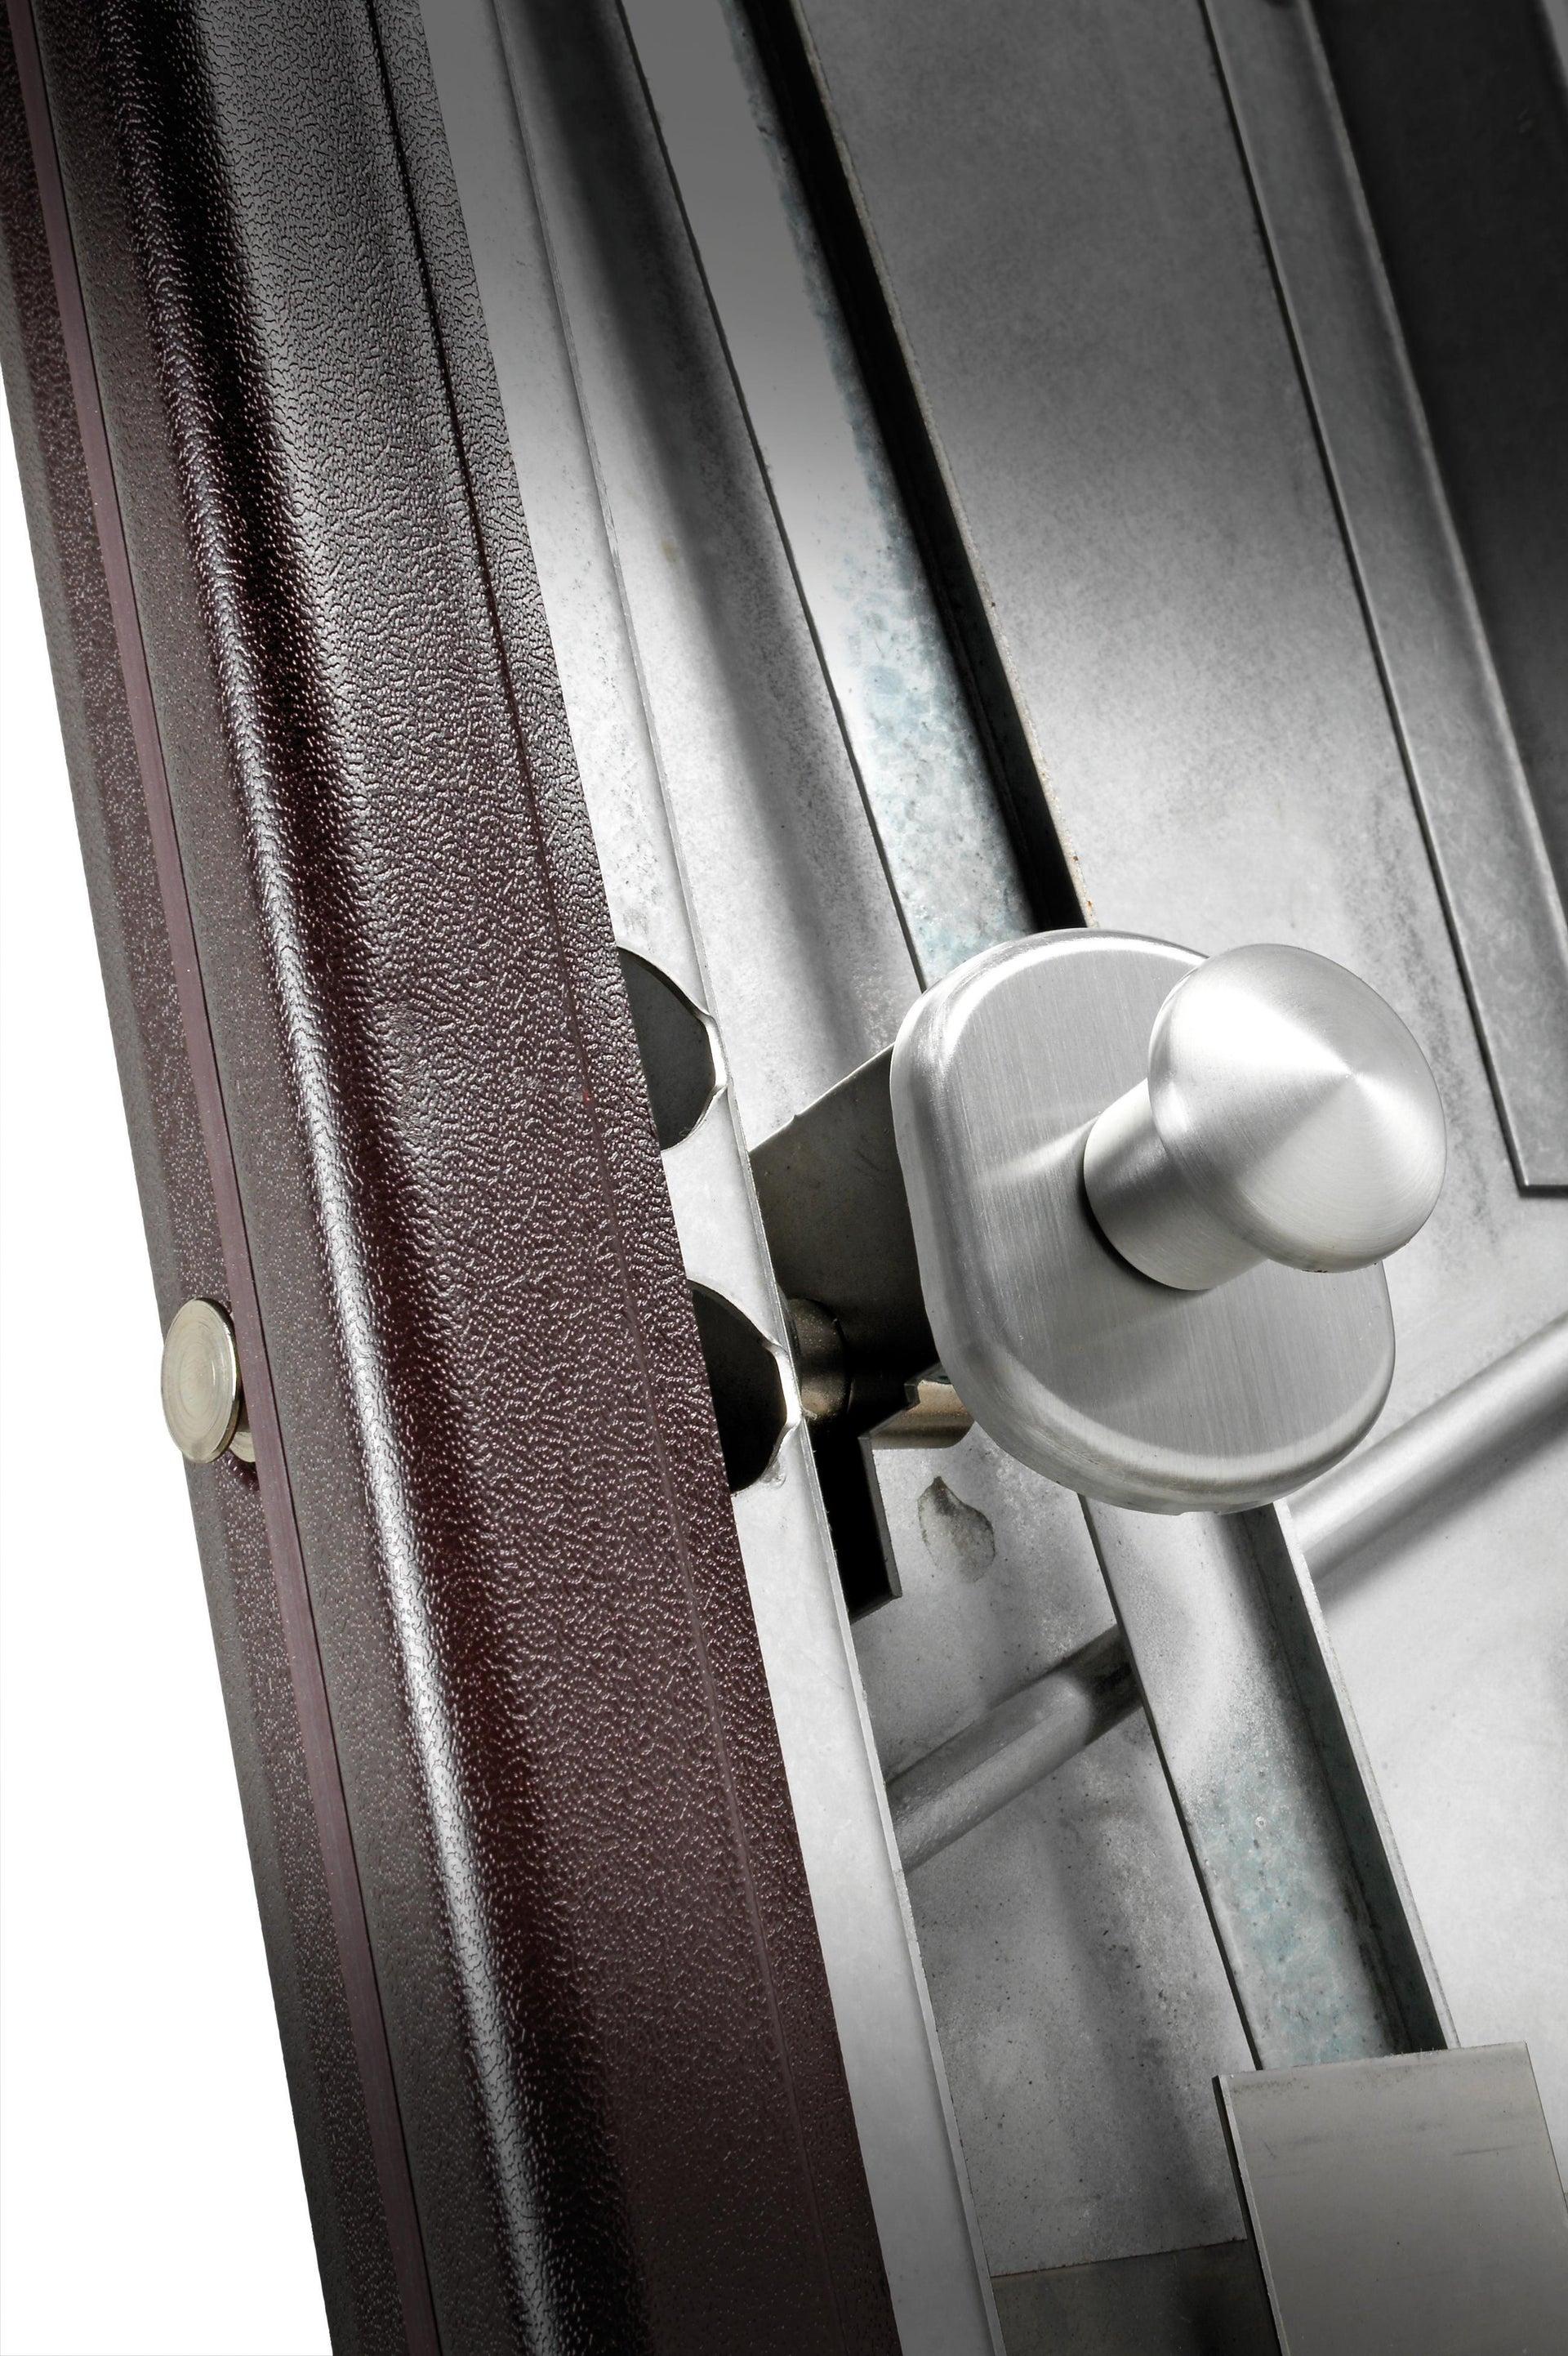 Porta blindata Hammer noce L 90 x H 210 cm sinistra - 3